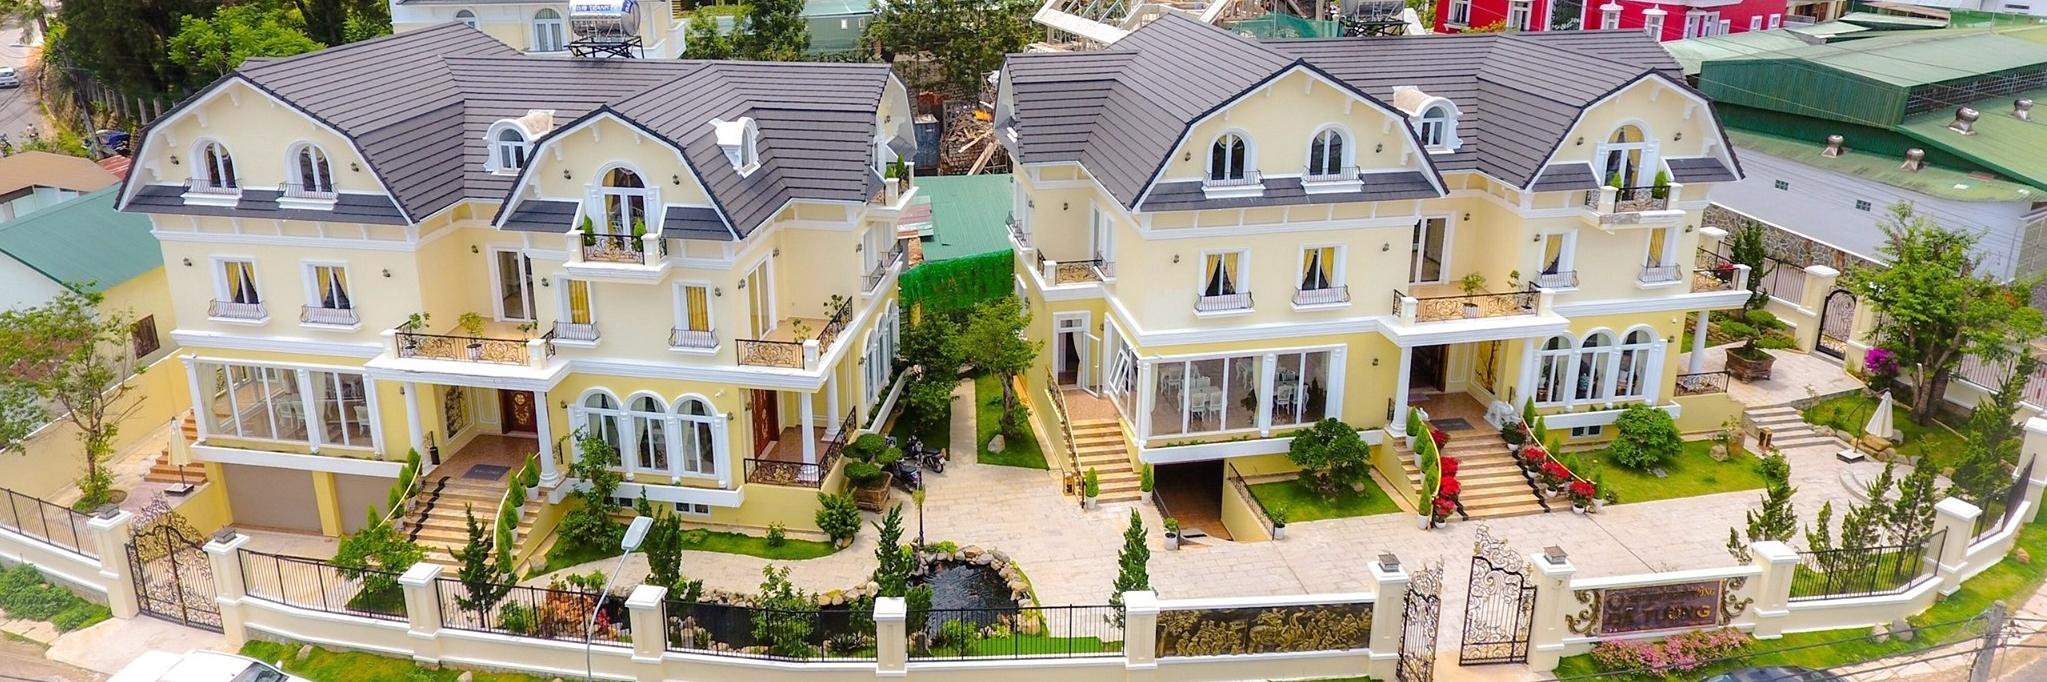 https://gody.vn/blog/nhugody959996/post/gom-tu-di-cung-nhau-de-tro-thanh-nguoi-dan-dau-ngay-tai-khach-san-solar-palace-da-lat-5716